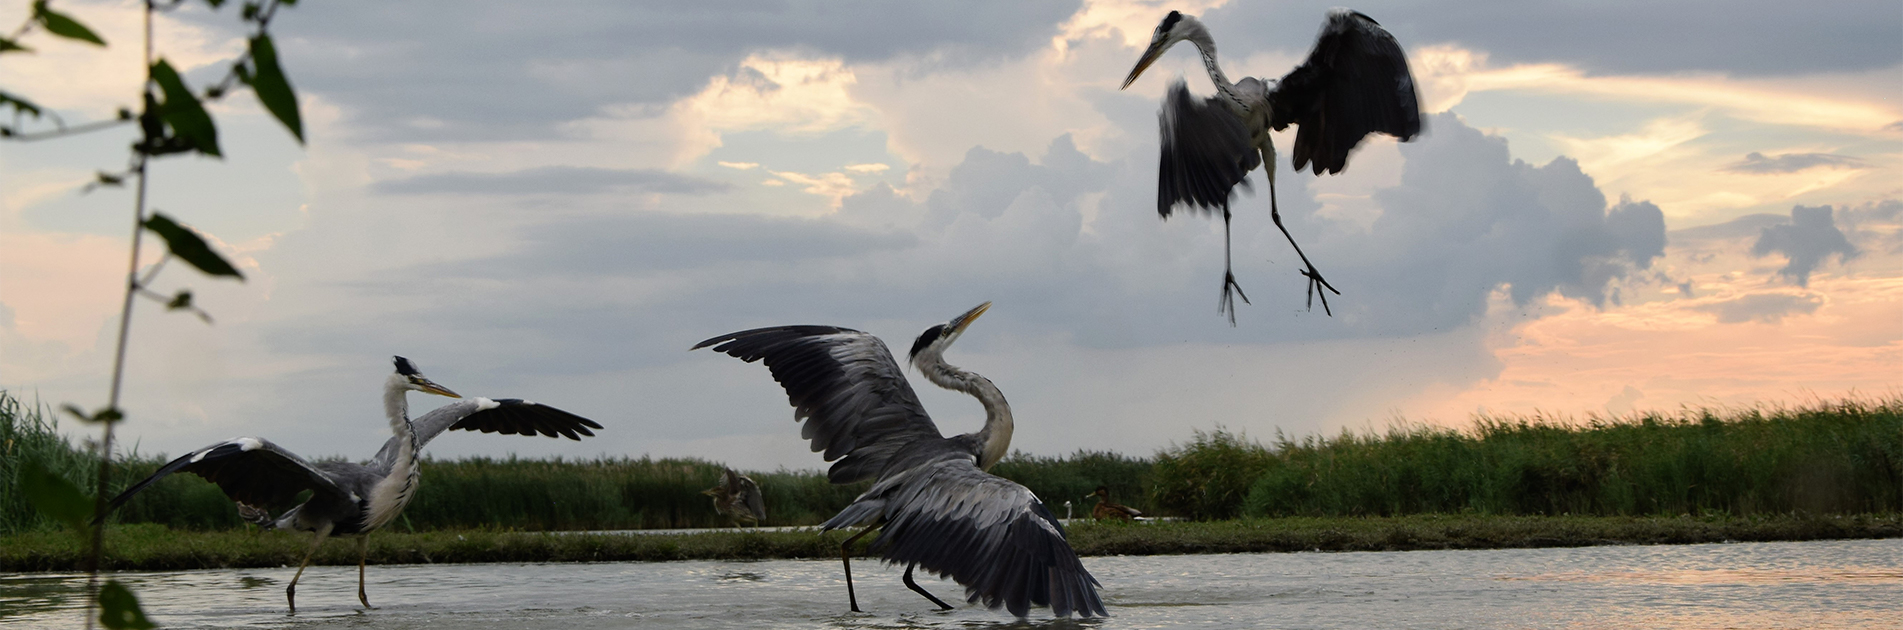 Fugleliv i Ungarn